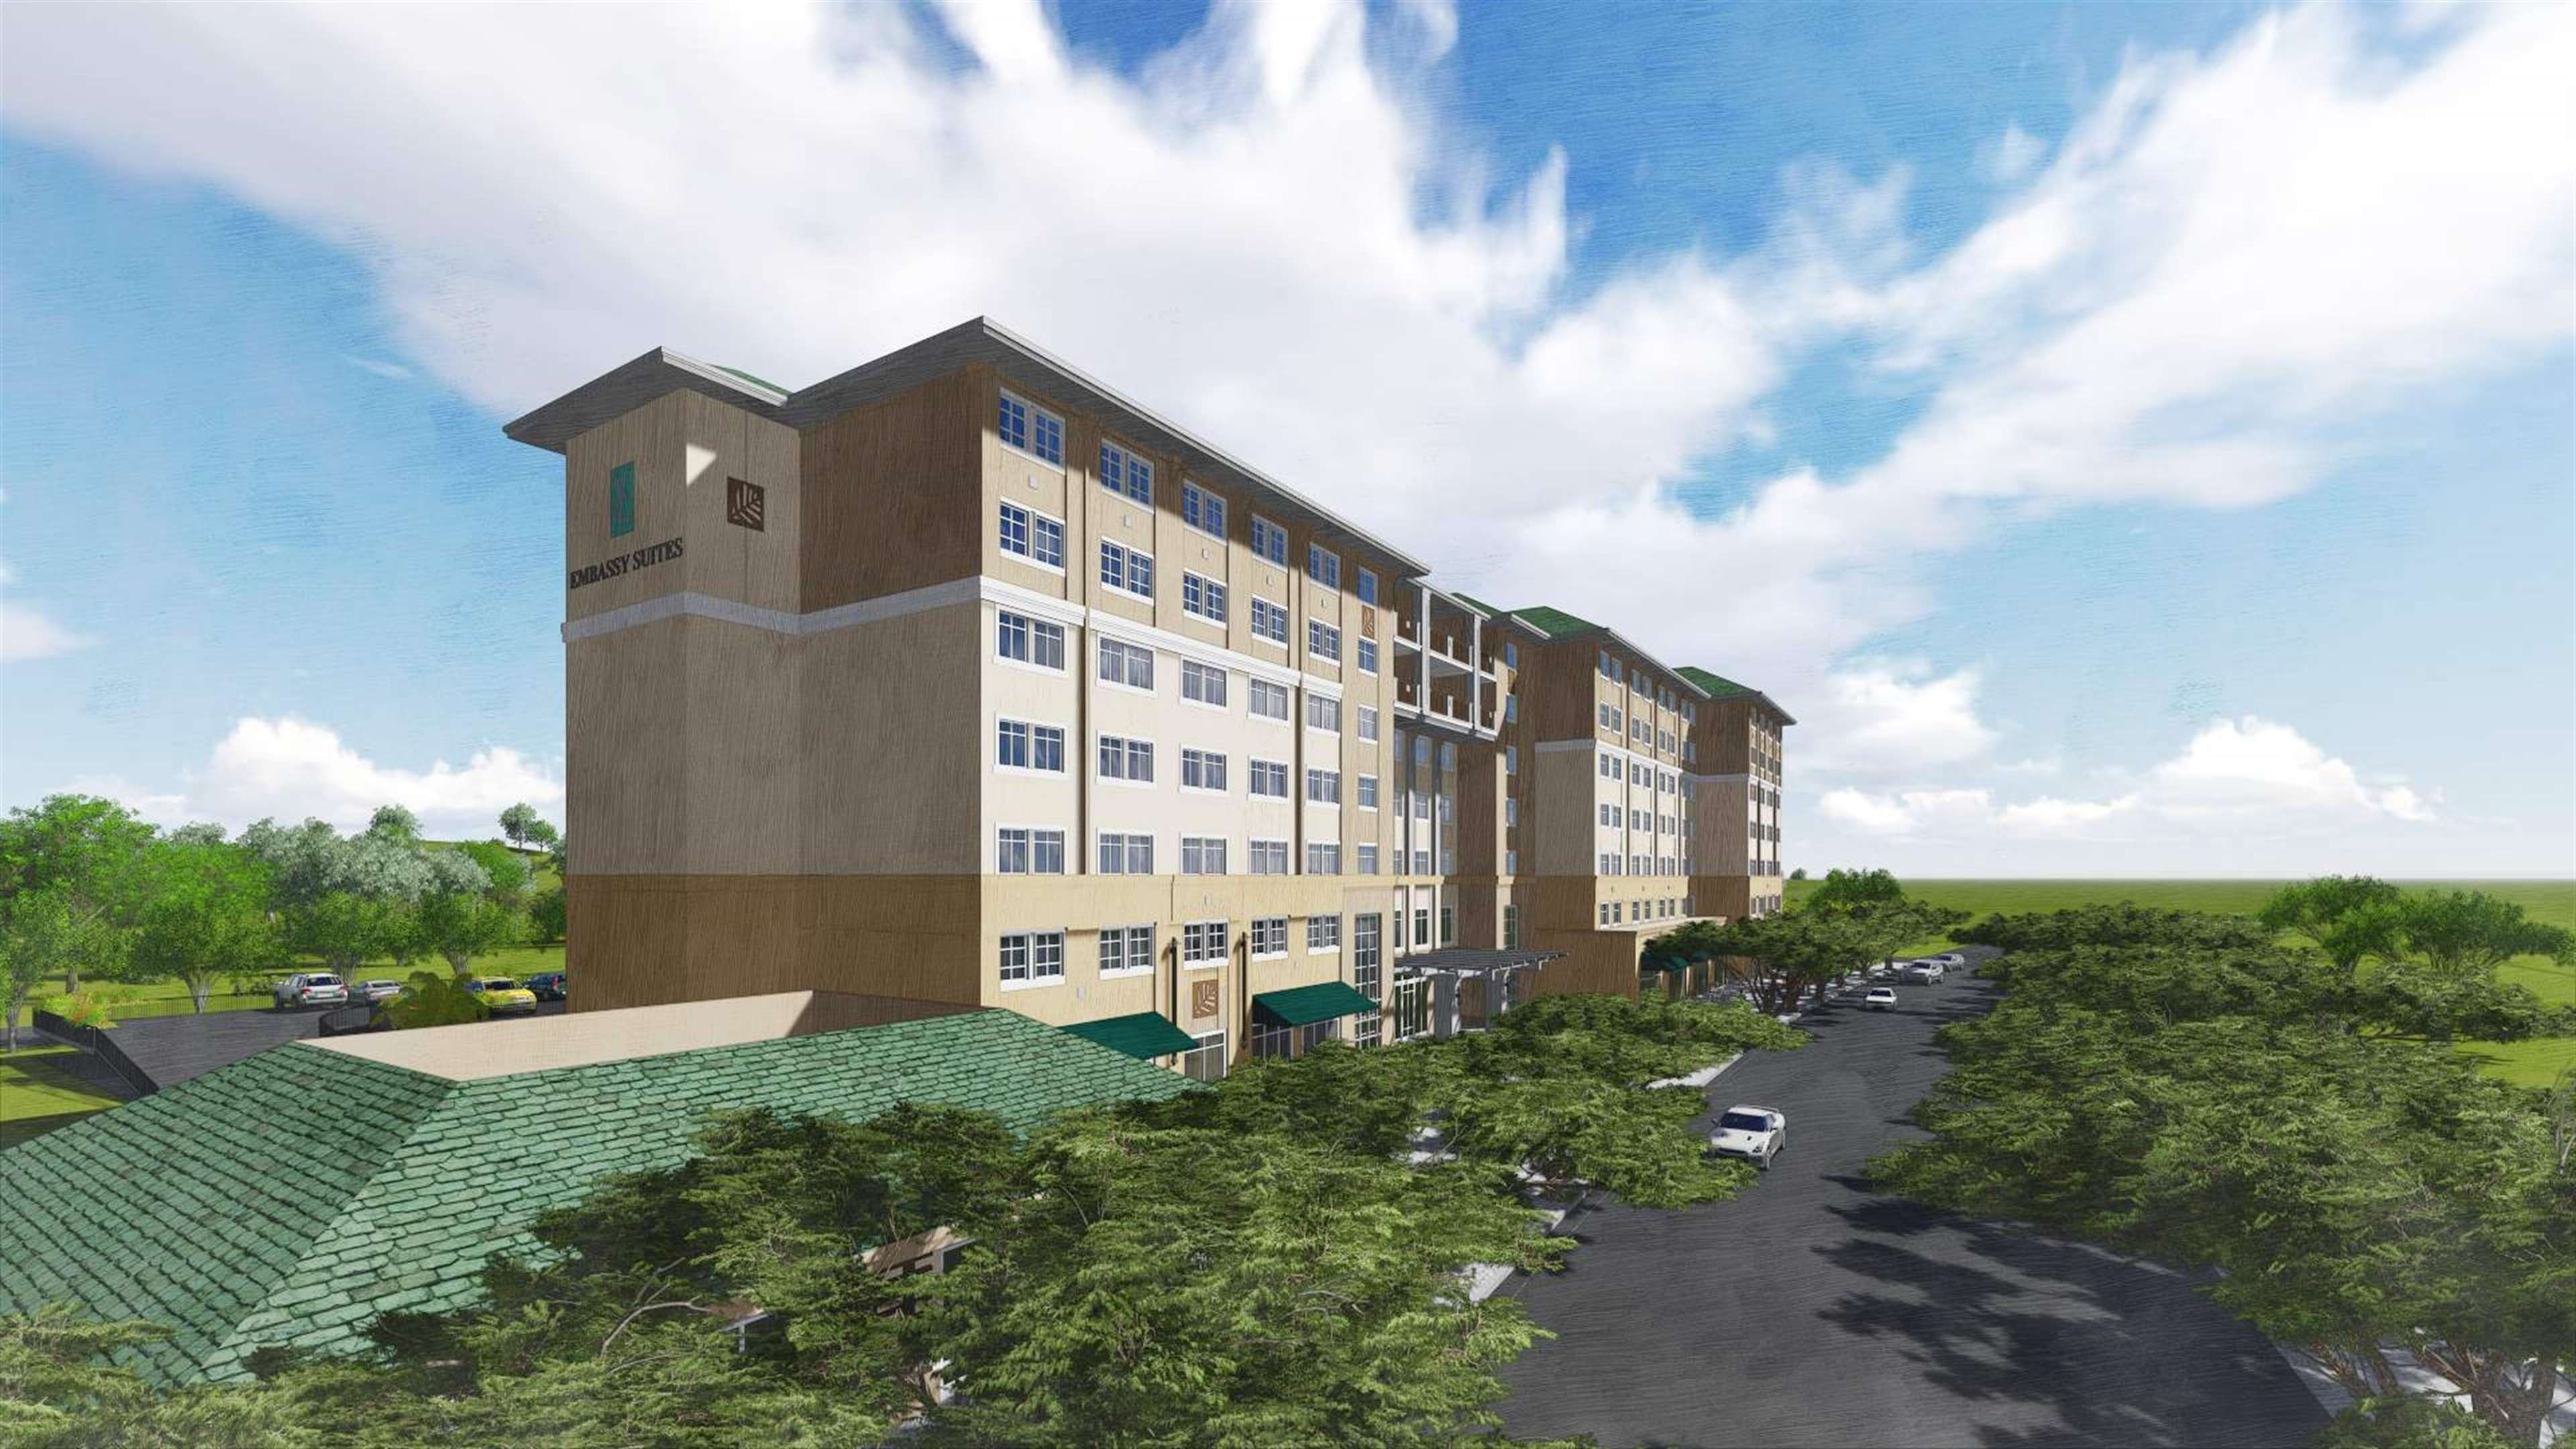 Embassy Suites by Hilton Oahu Kapolei image 0